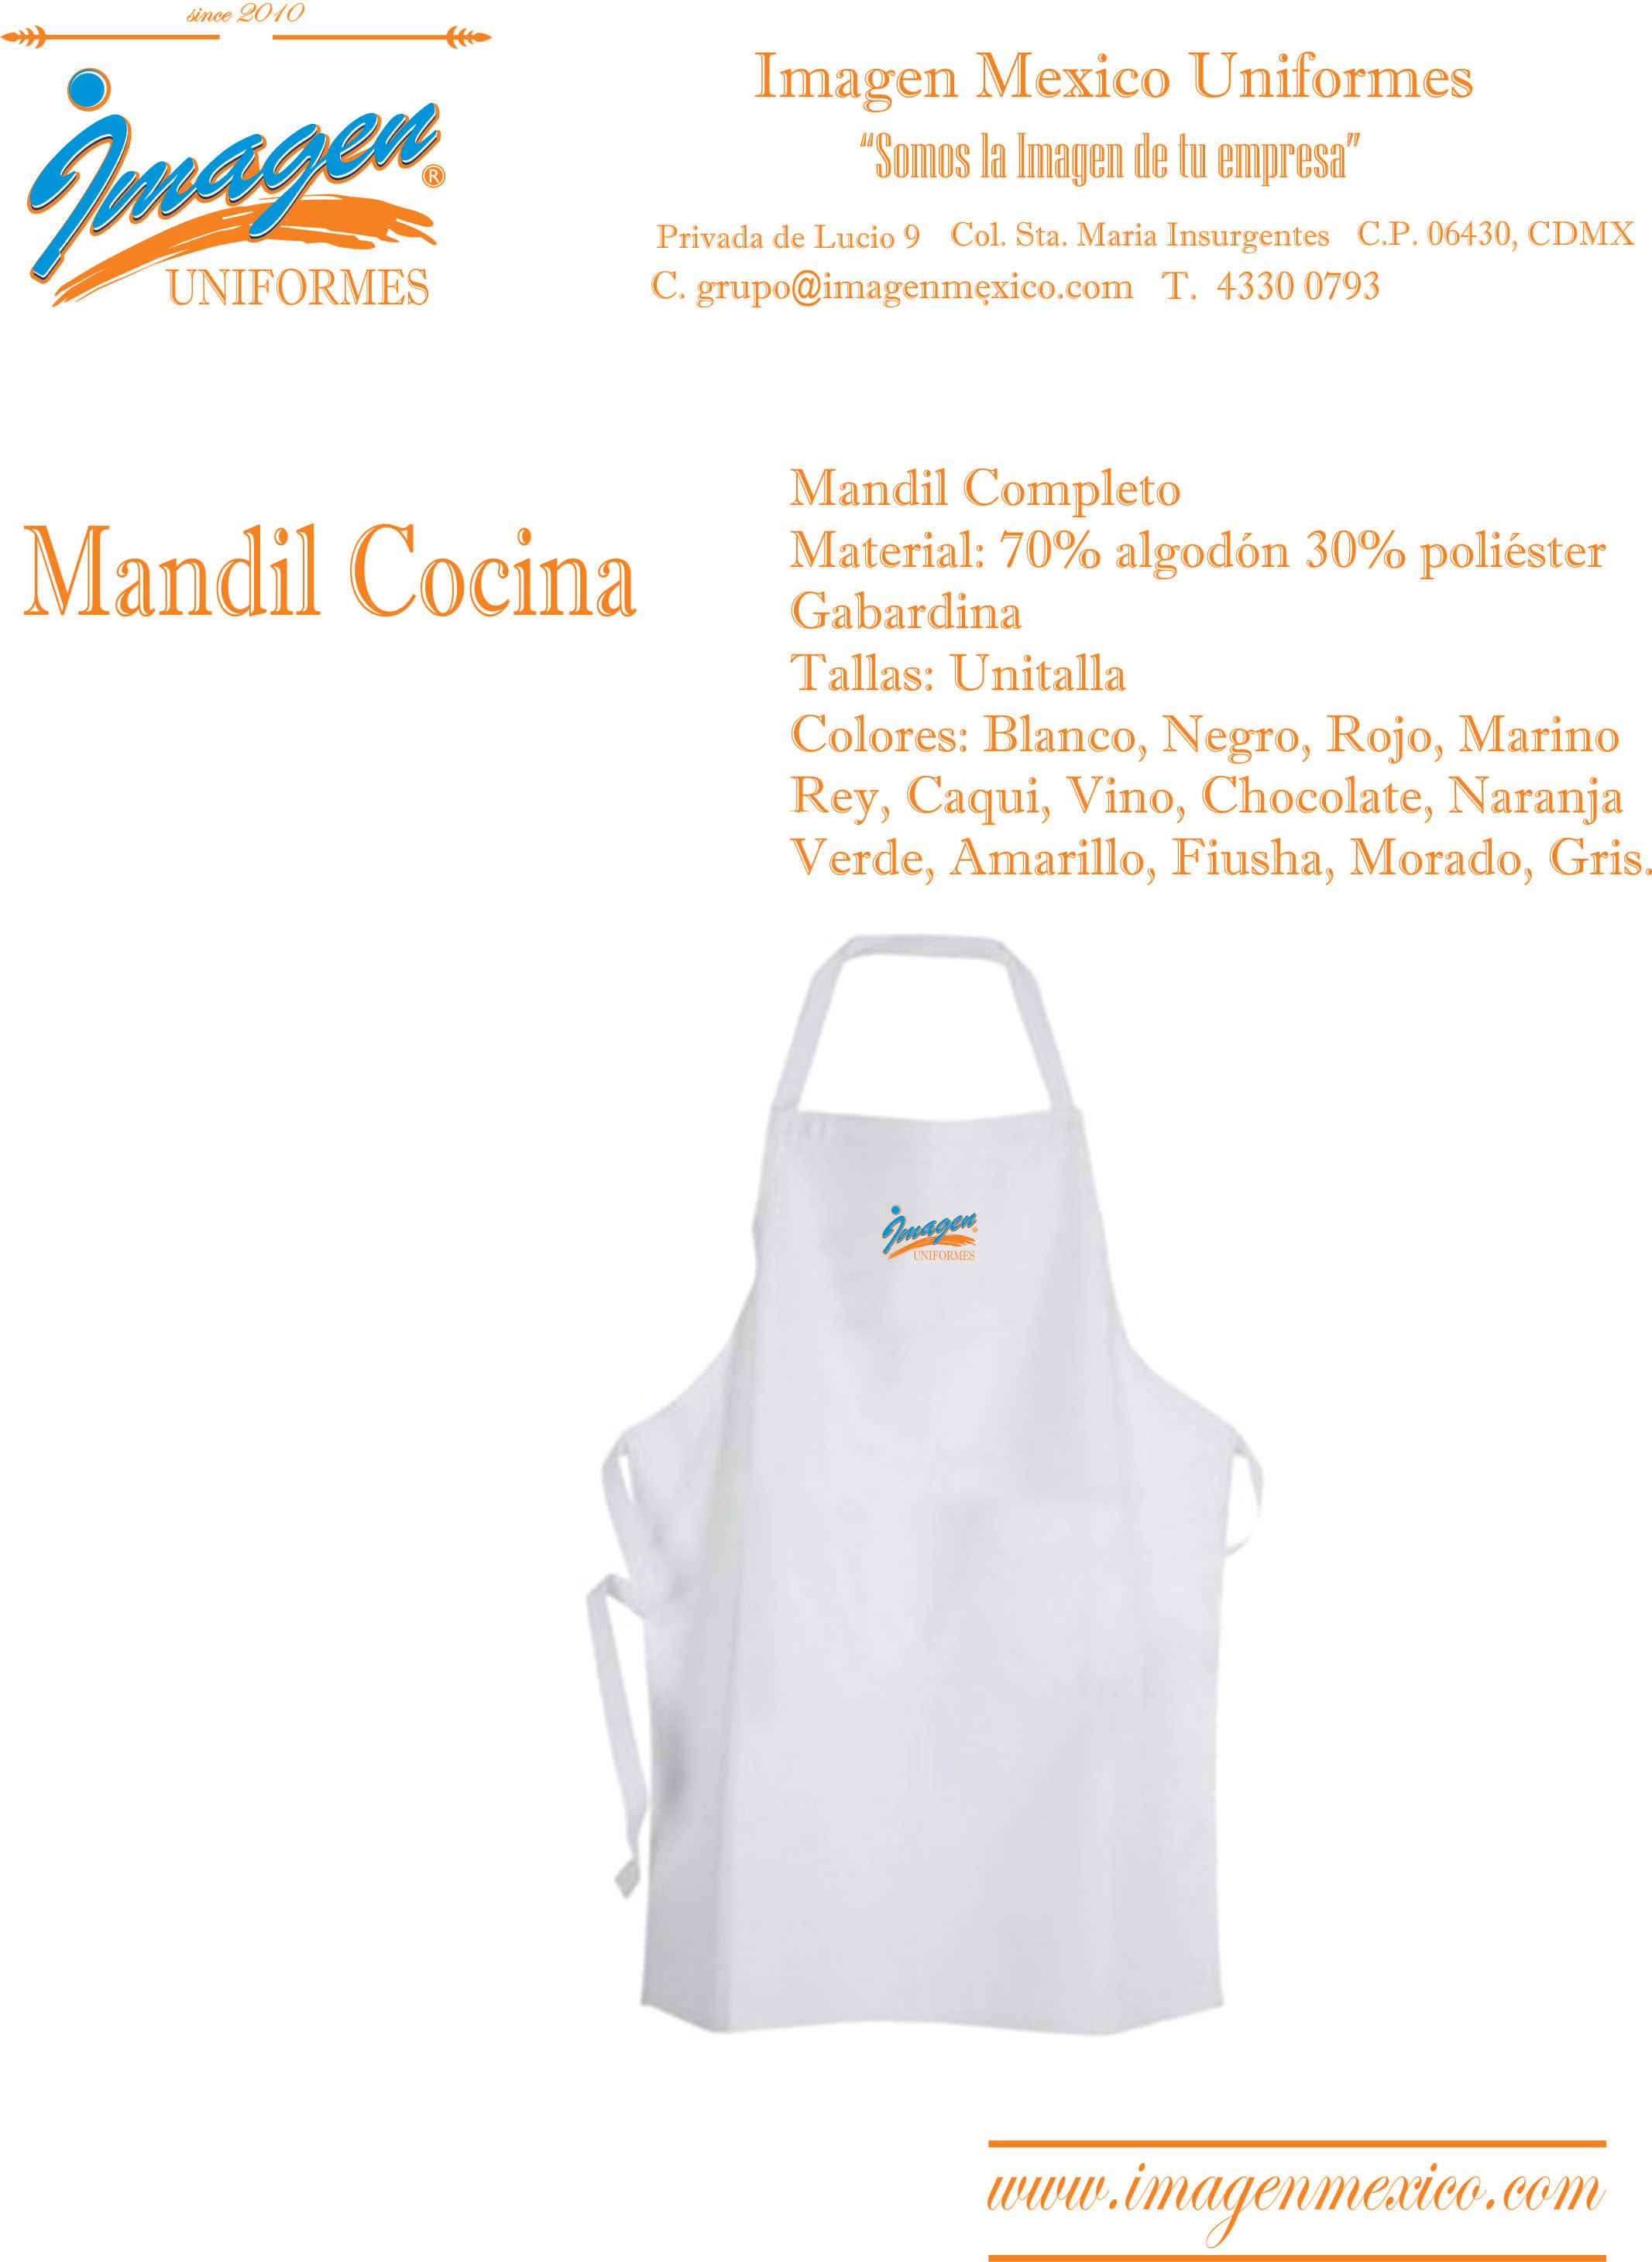 MANDIL COCINA